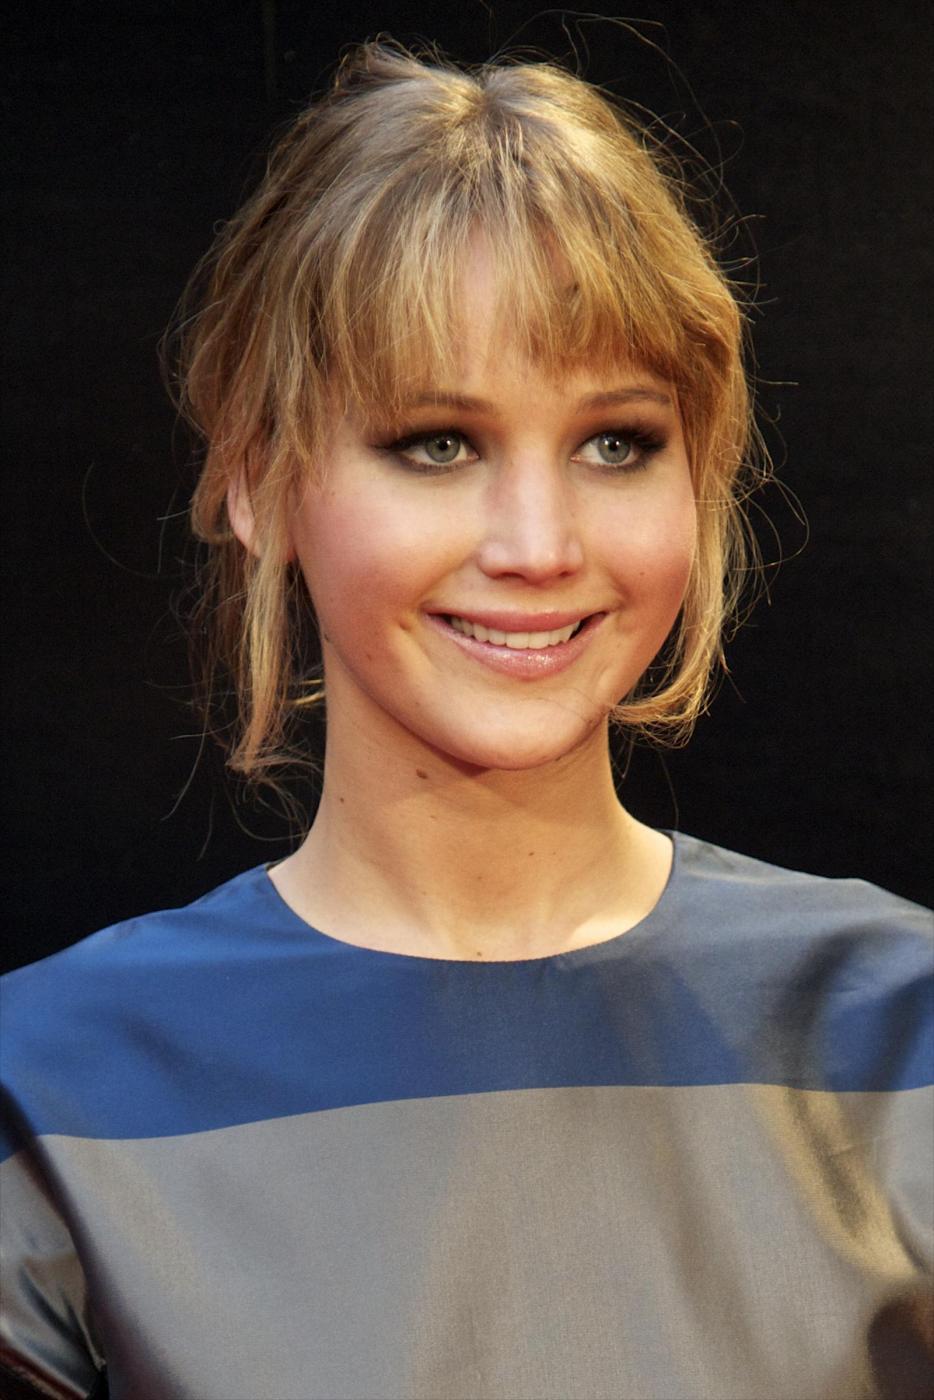 Jennifer Lawrence, com'era e com'è FOTO 35